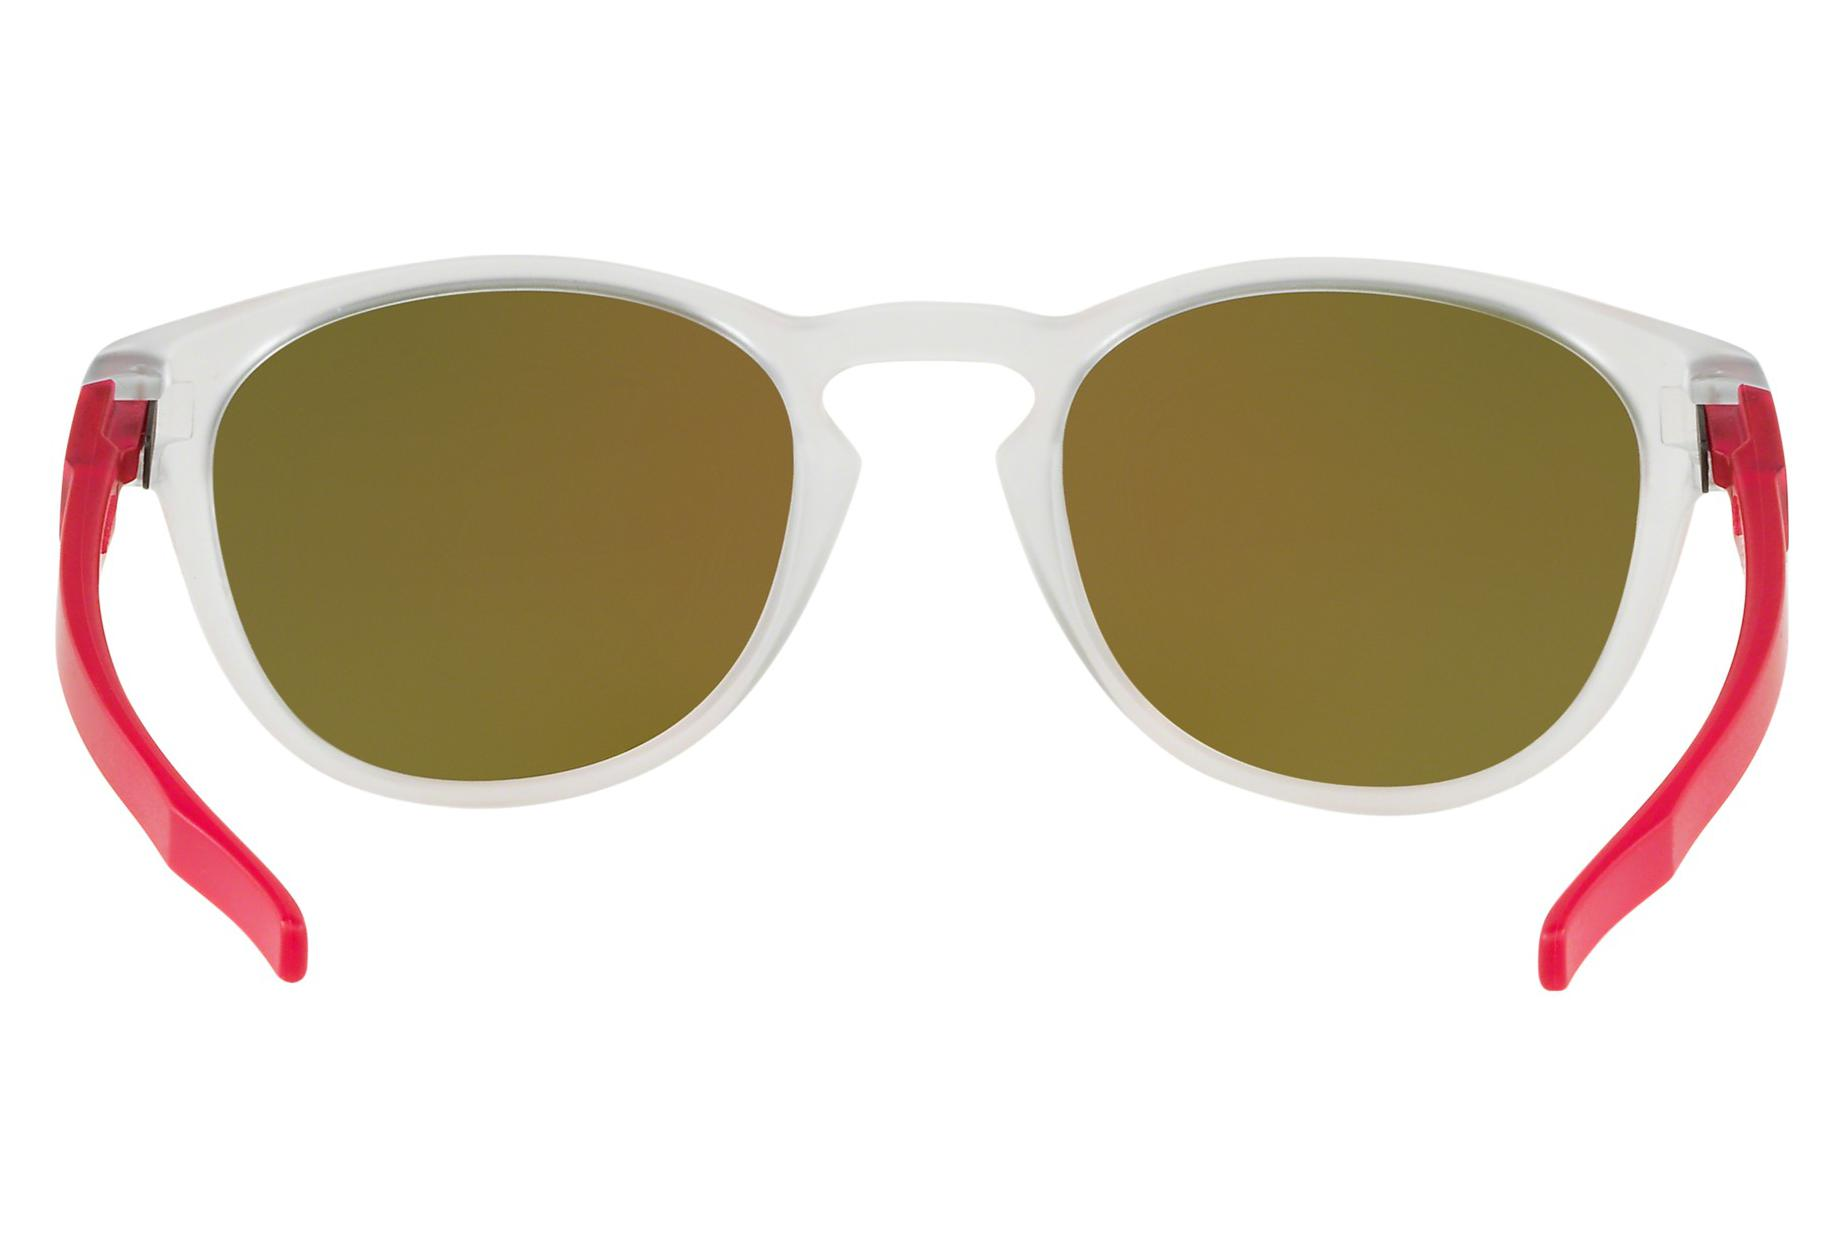 9bc61a40bd4f7 Oakley Sunglasses Latch Crystal Pop Matte Clear   Prizm Ruby   Ref.  OO9265-4753